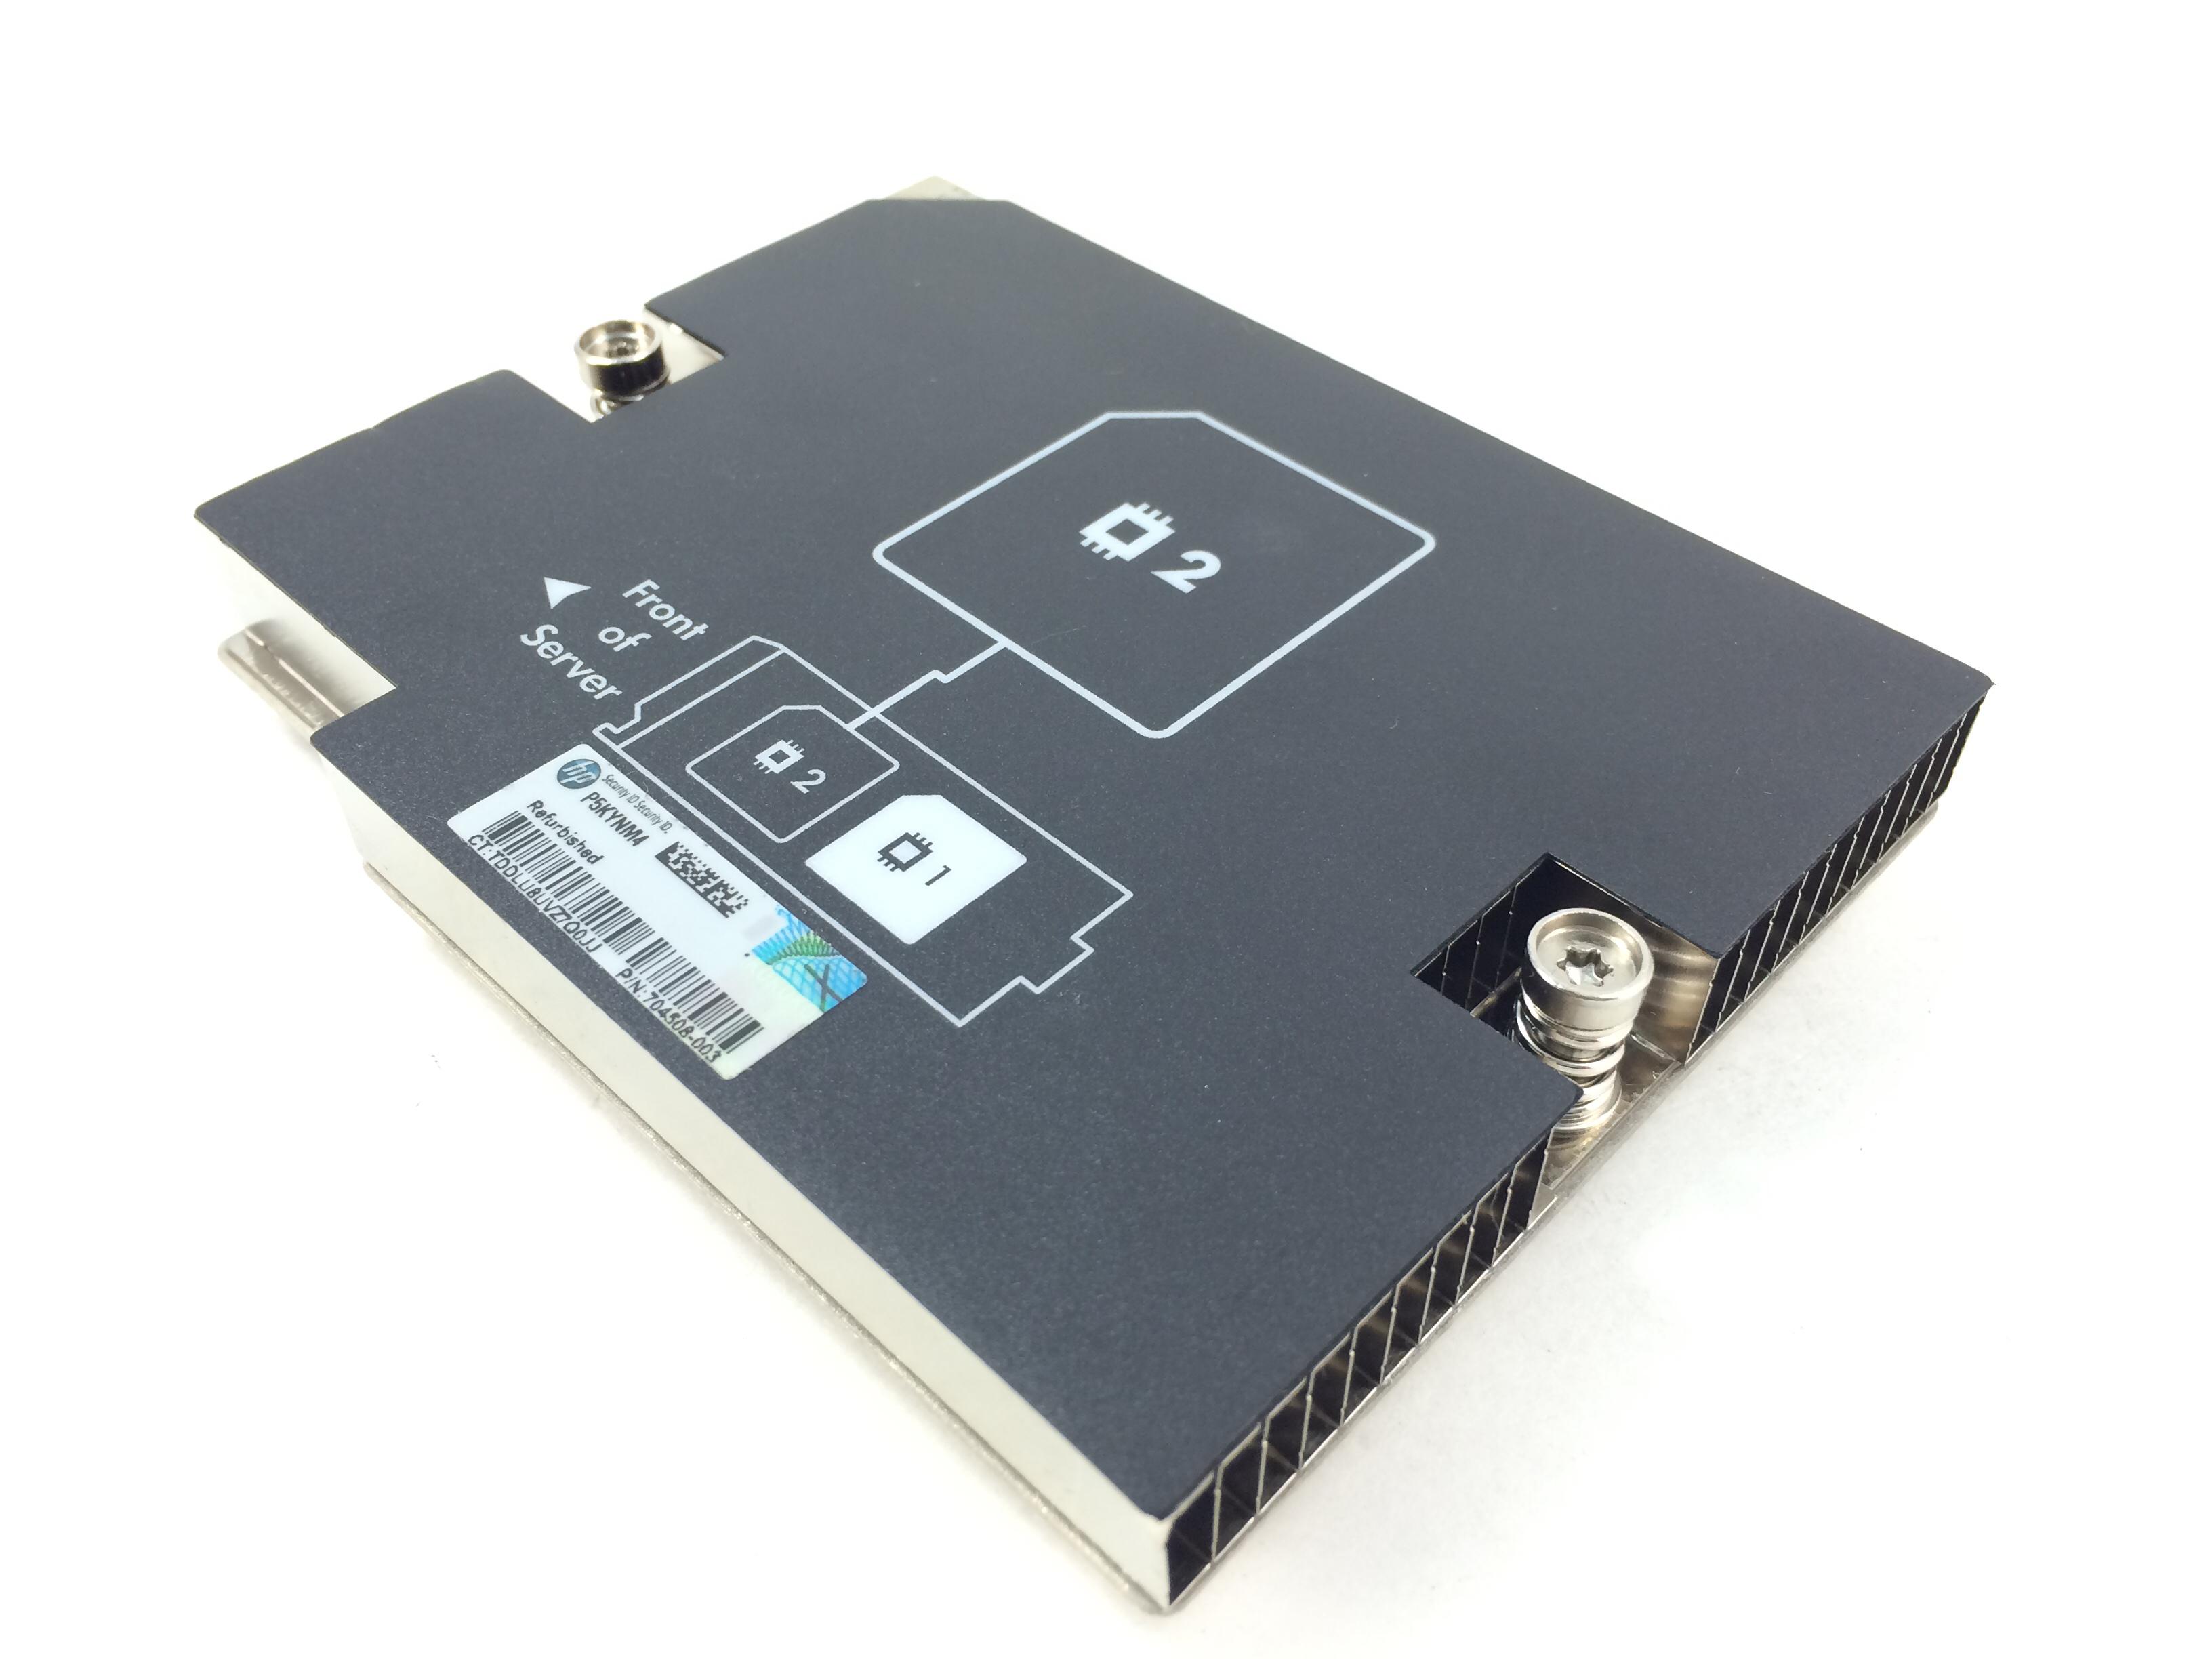 HP Proliant Bl465C G8 Server Heatsink (672720-001)